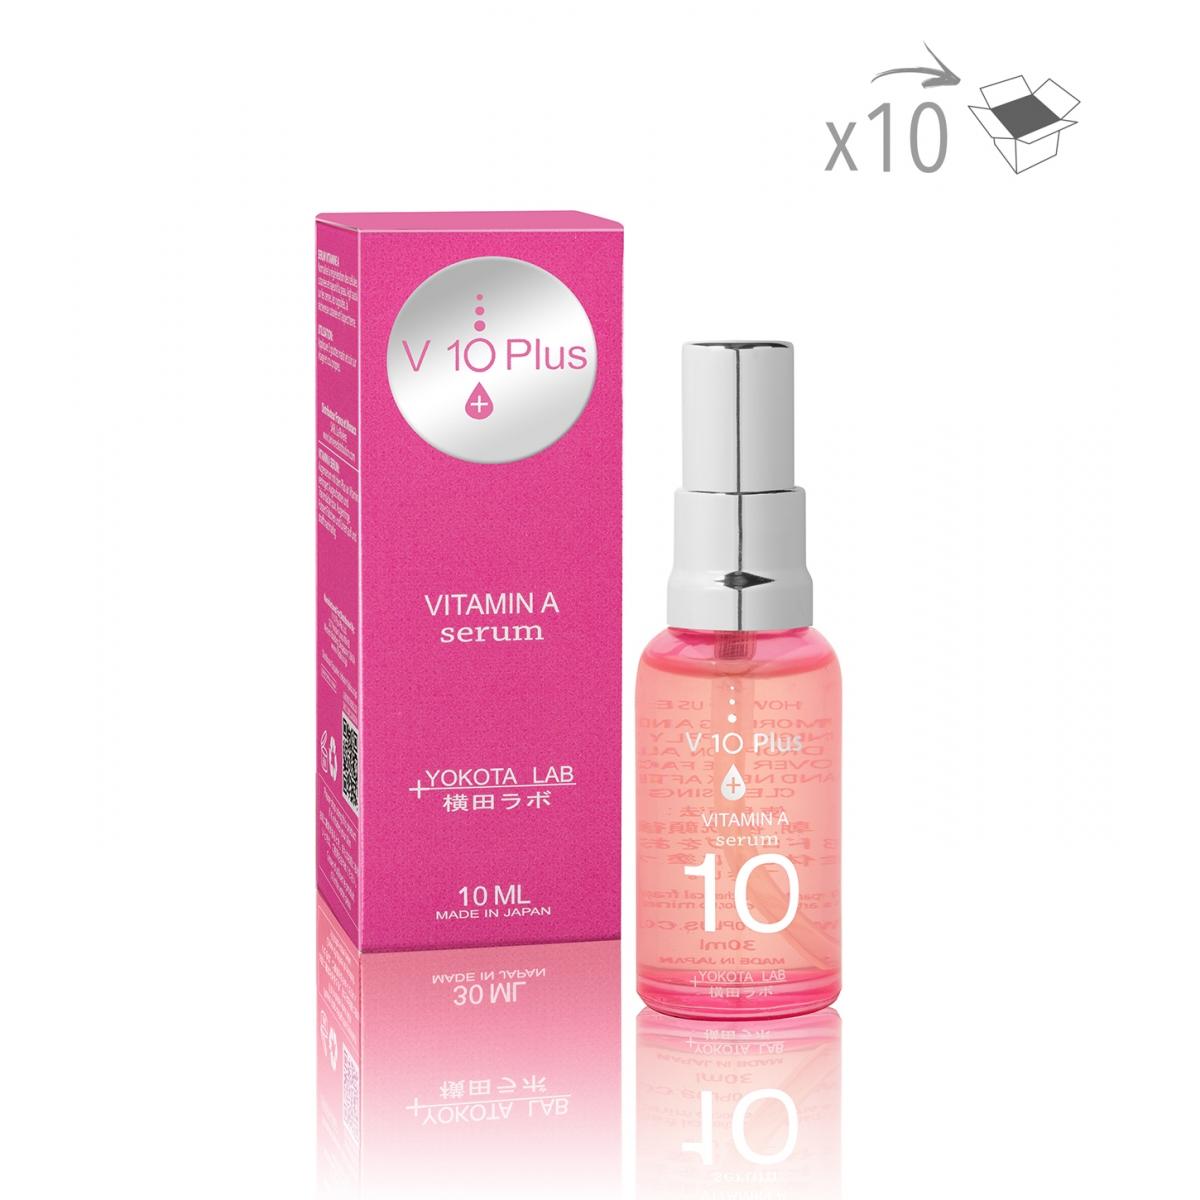 PRODUITS A LA REVENTE - VITAMINE A SERUM V10+ (30 ml) (x10)